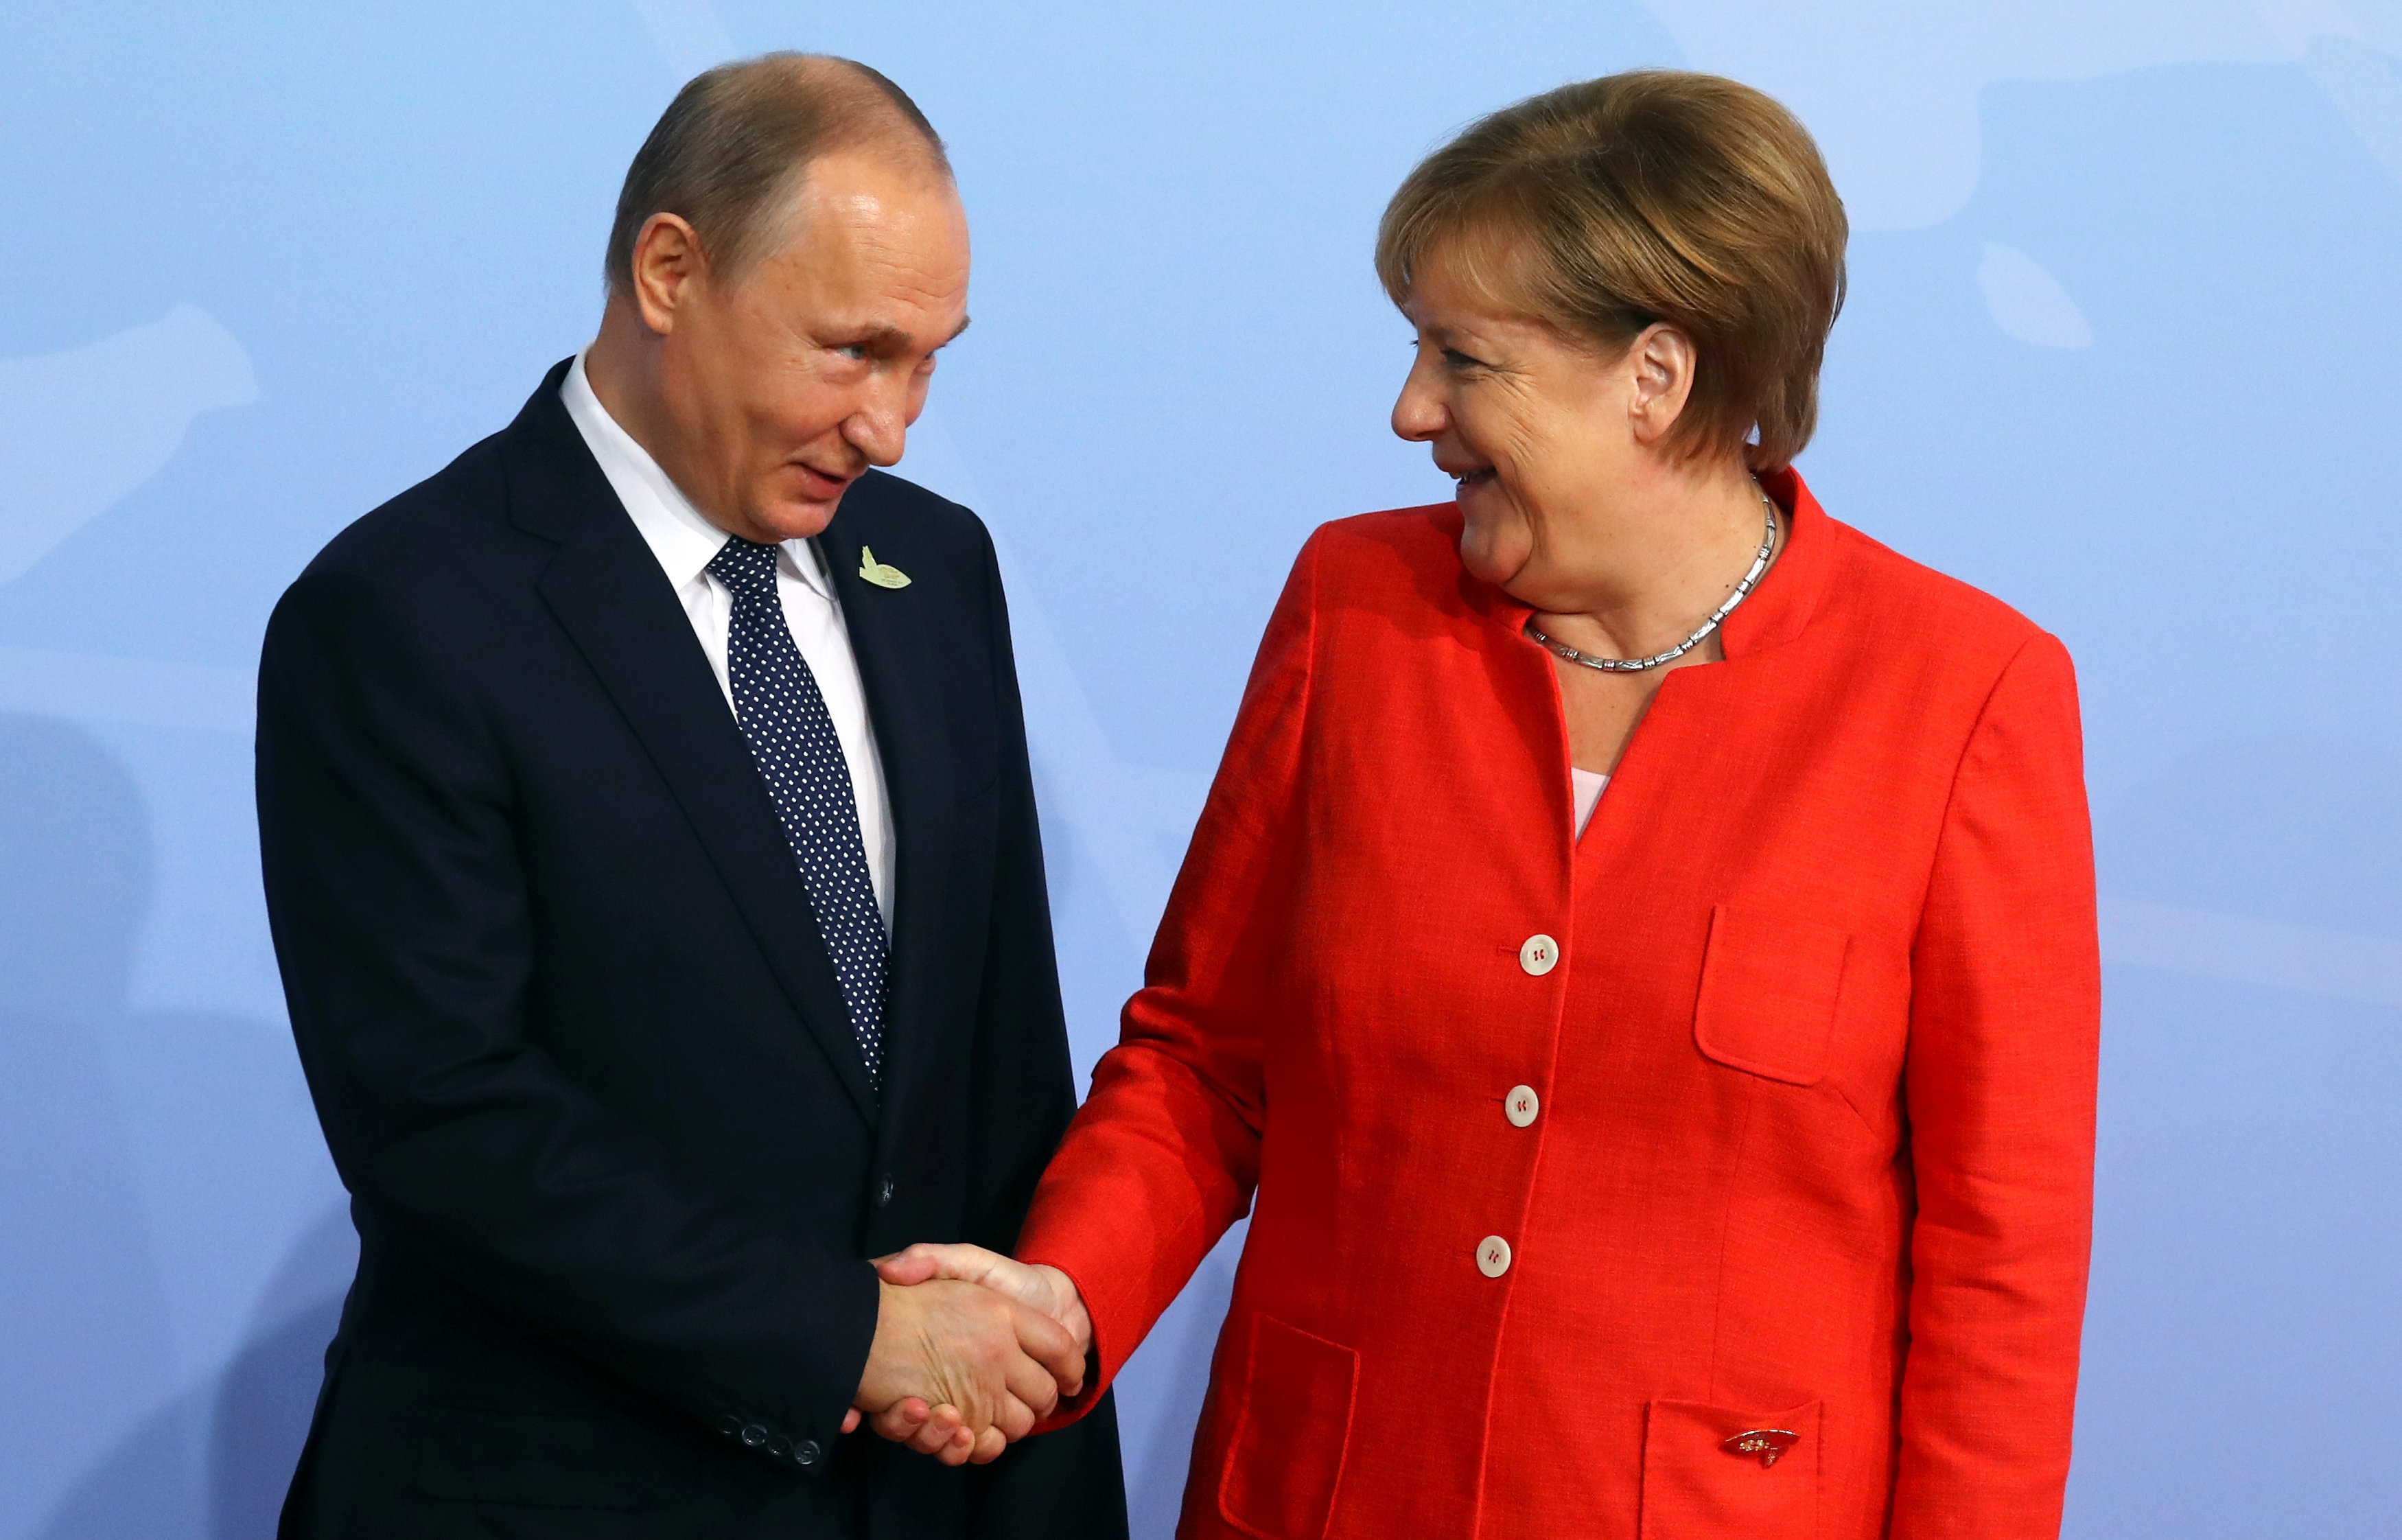 German Chancellor Angela Merkel greets Russian President Vladimir Putin as he arrives for the G20 leaders summit in Hamburg, Germany July 7, 2017